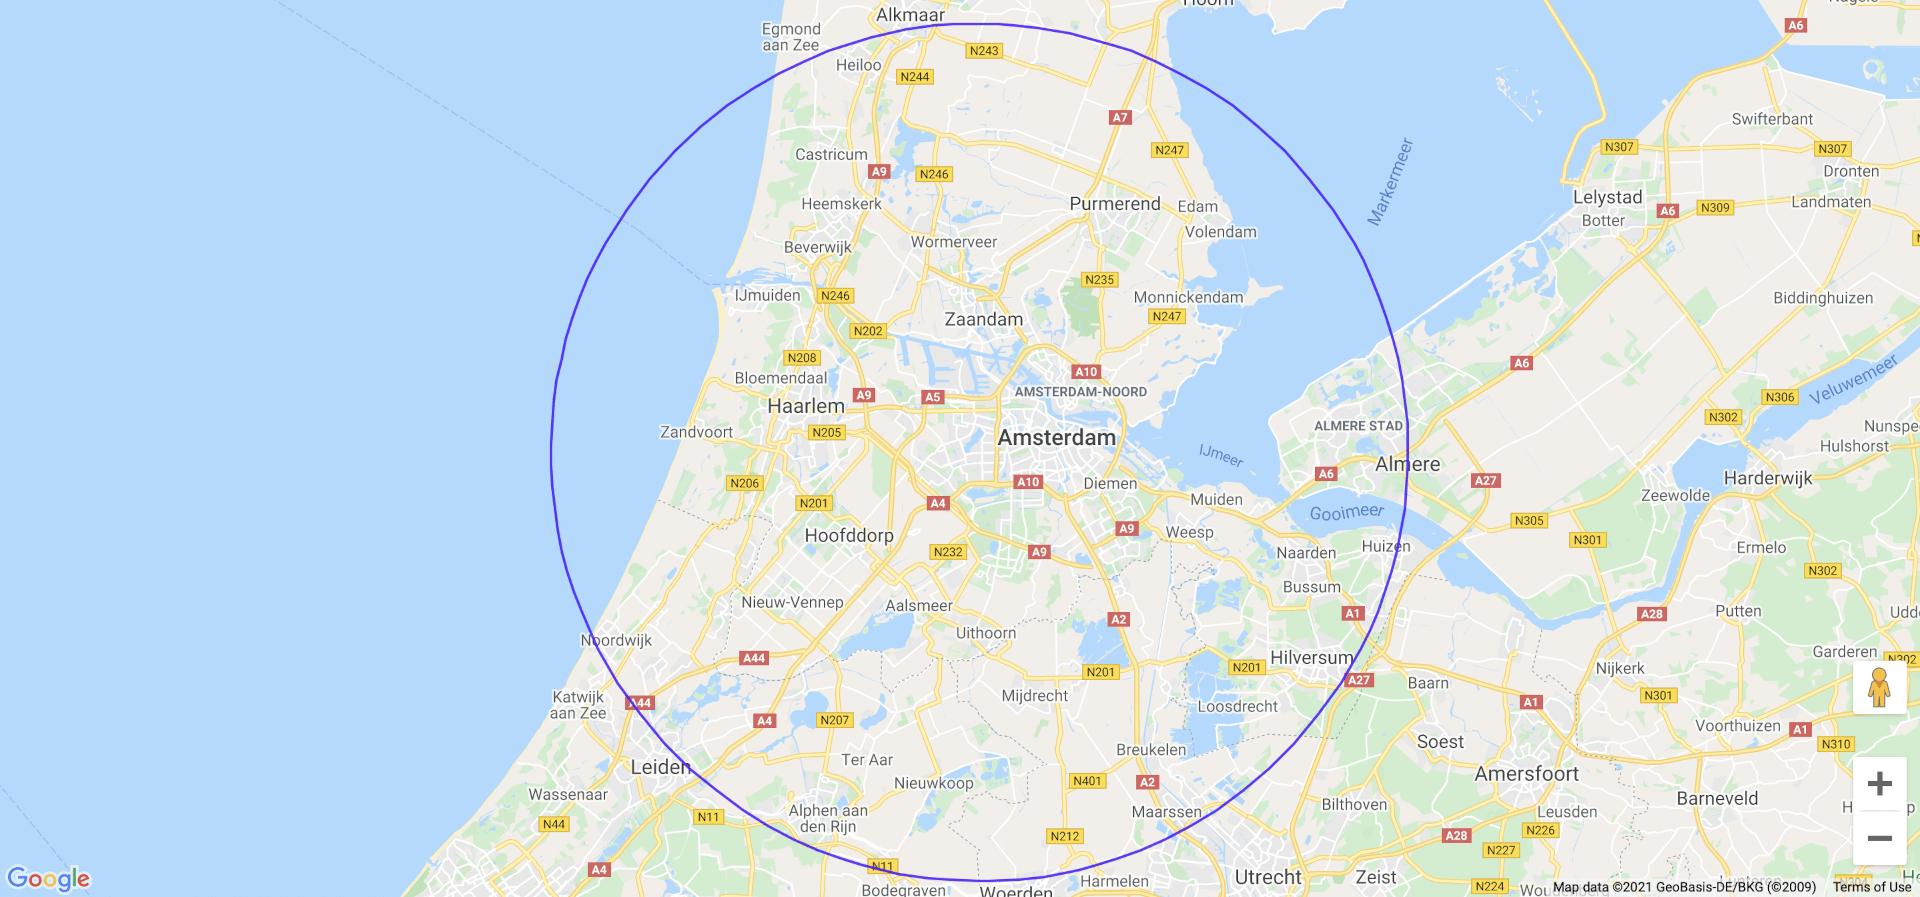 Fietsenmaker op locatie in Amsterdam en omgeving